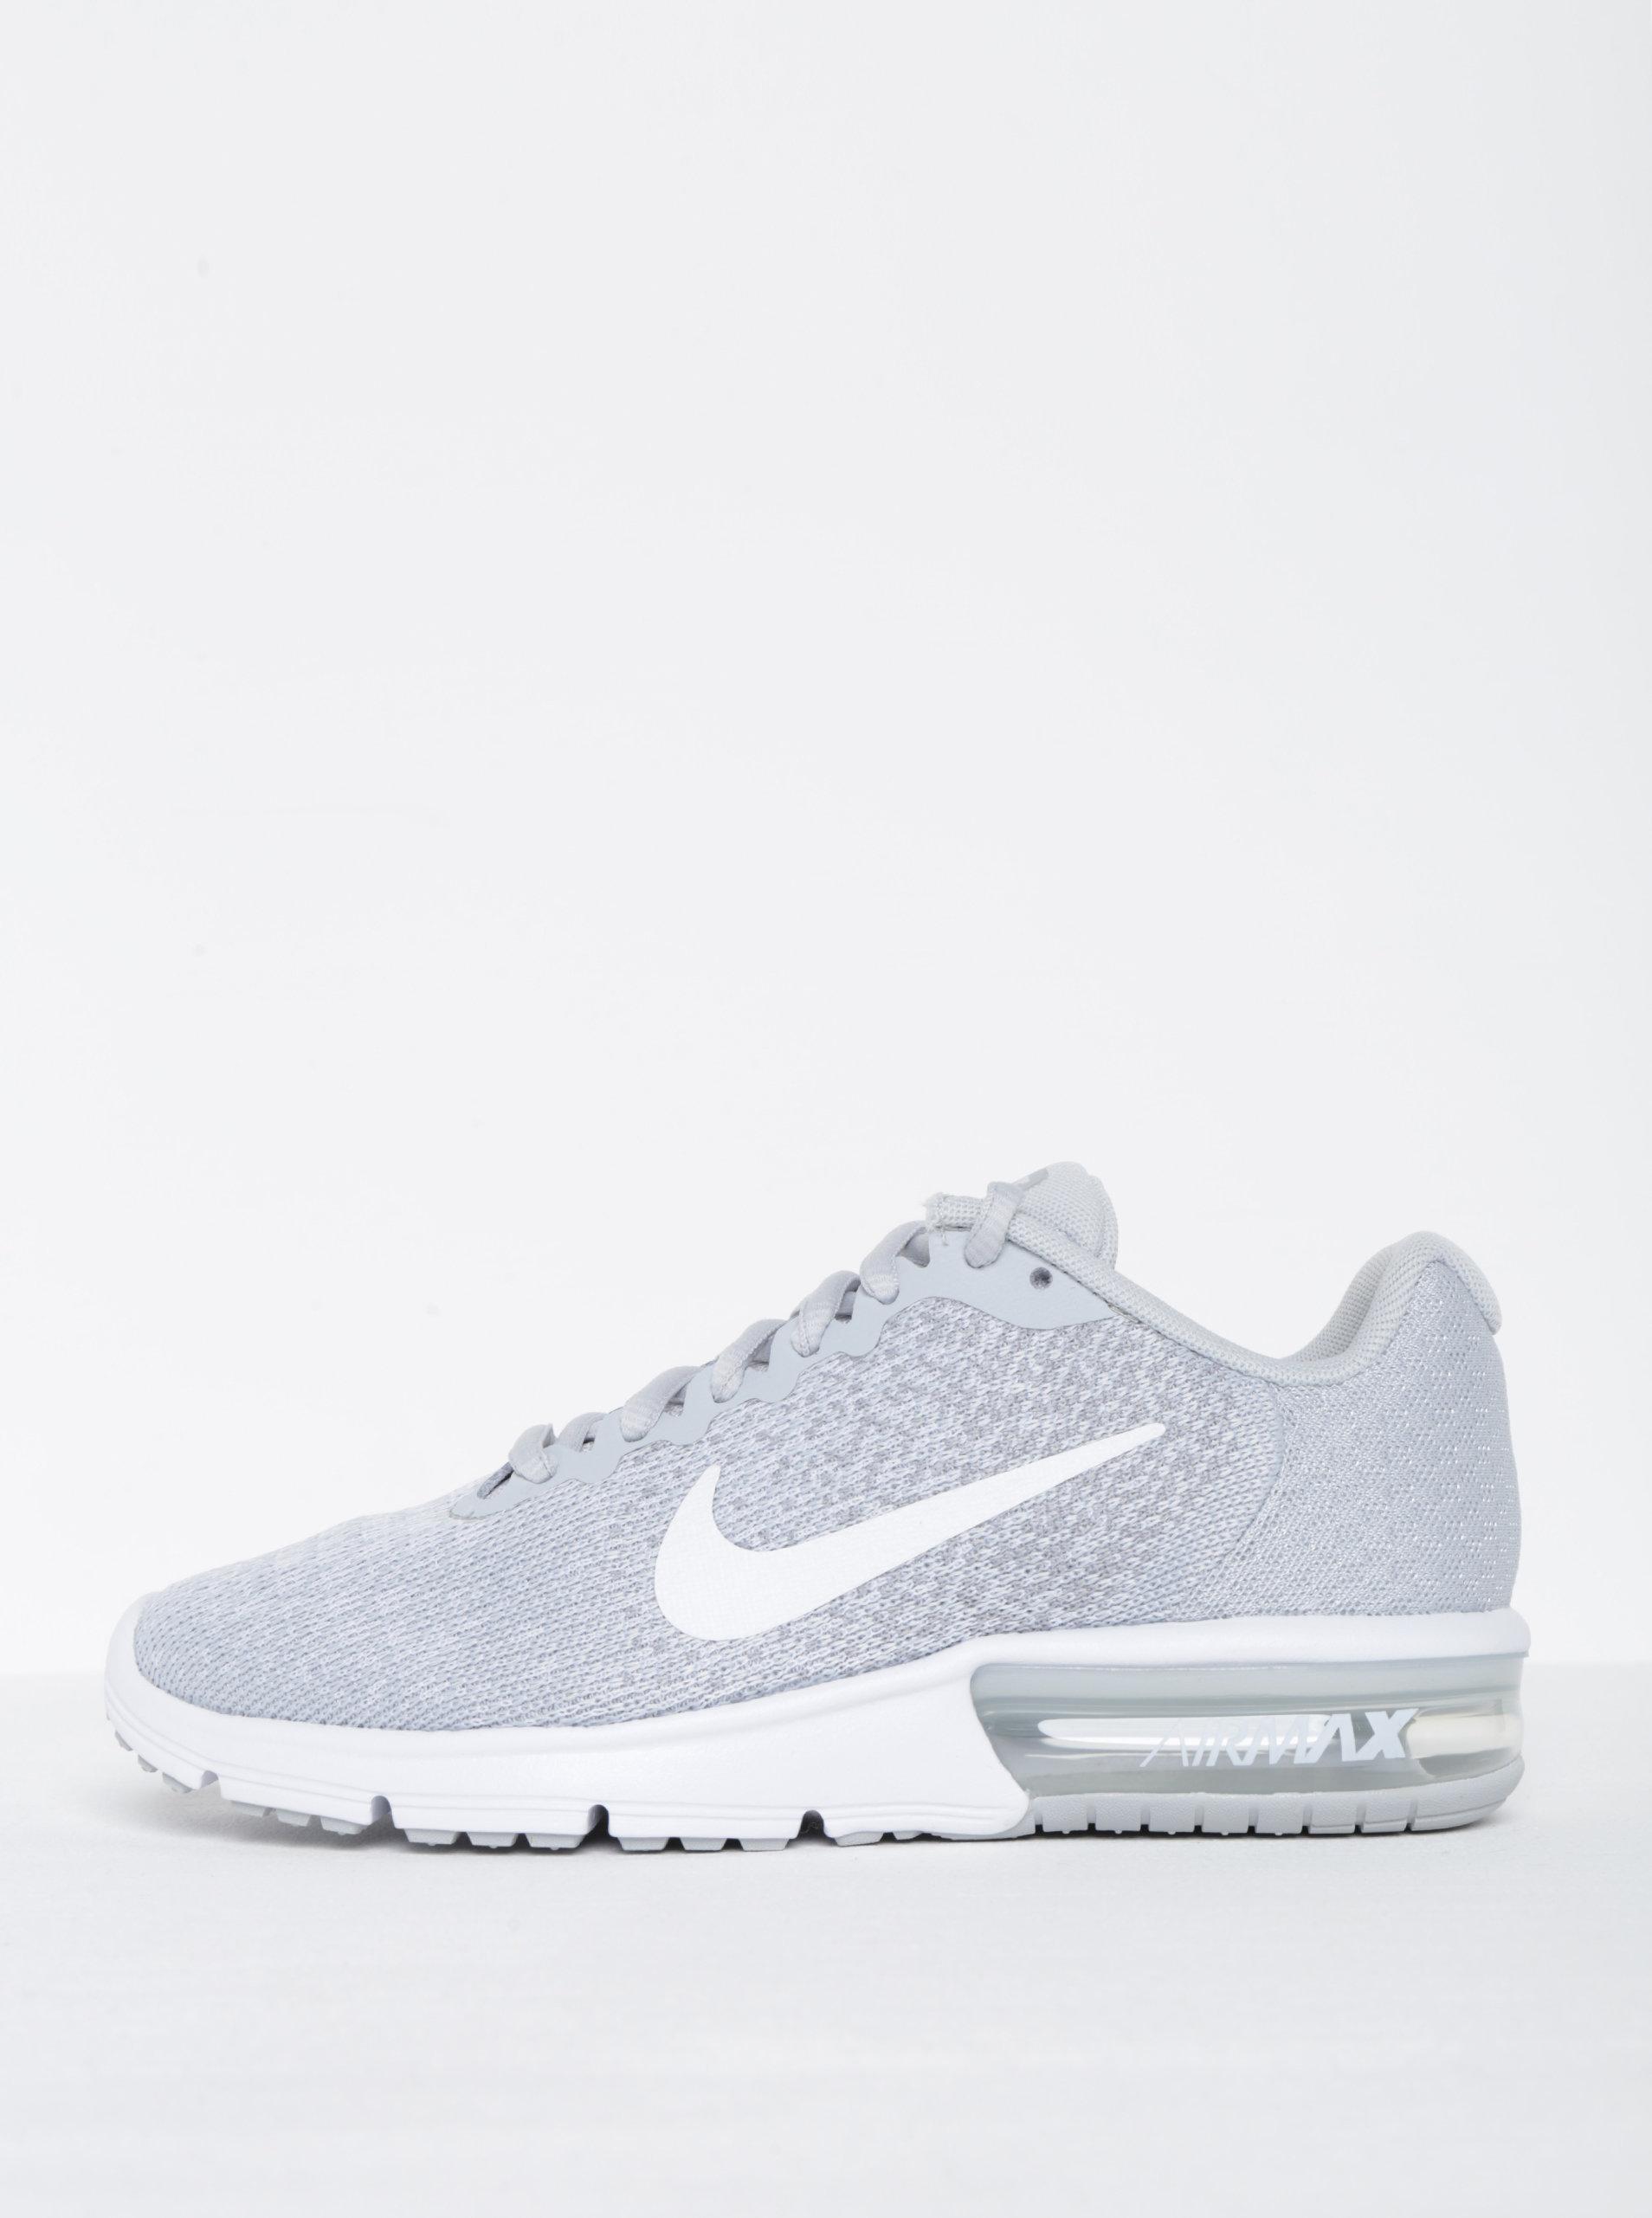 de098af0030 Světle šedé žíhané dámské tenisky Nike Air Max Sequent ...